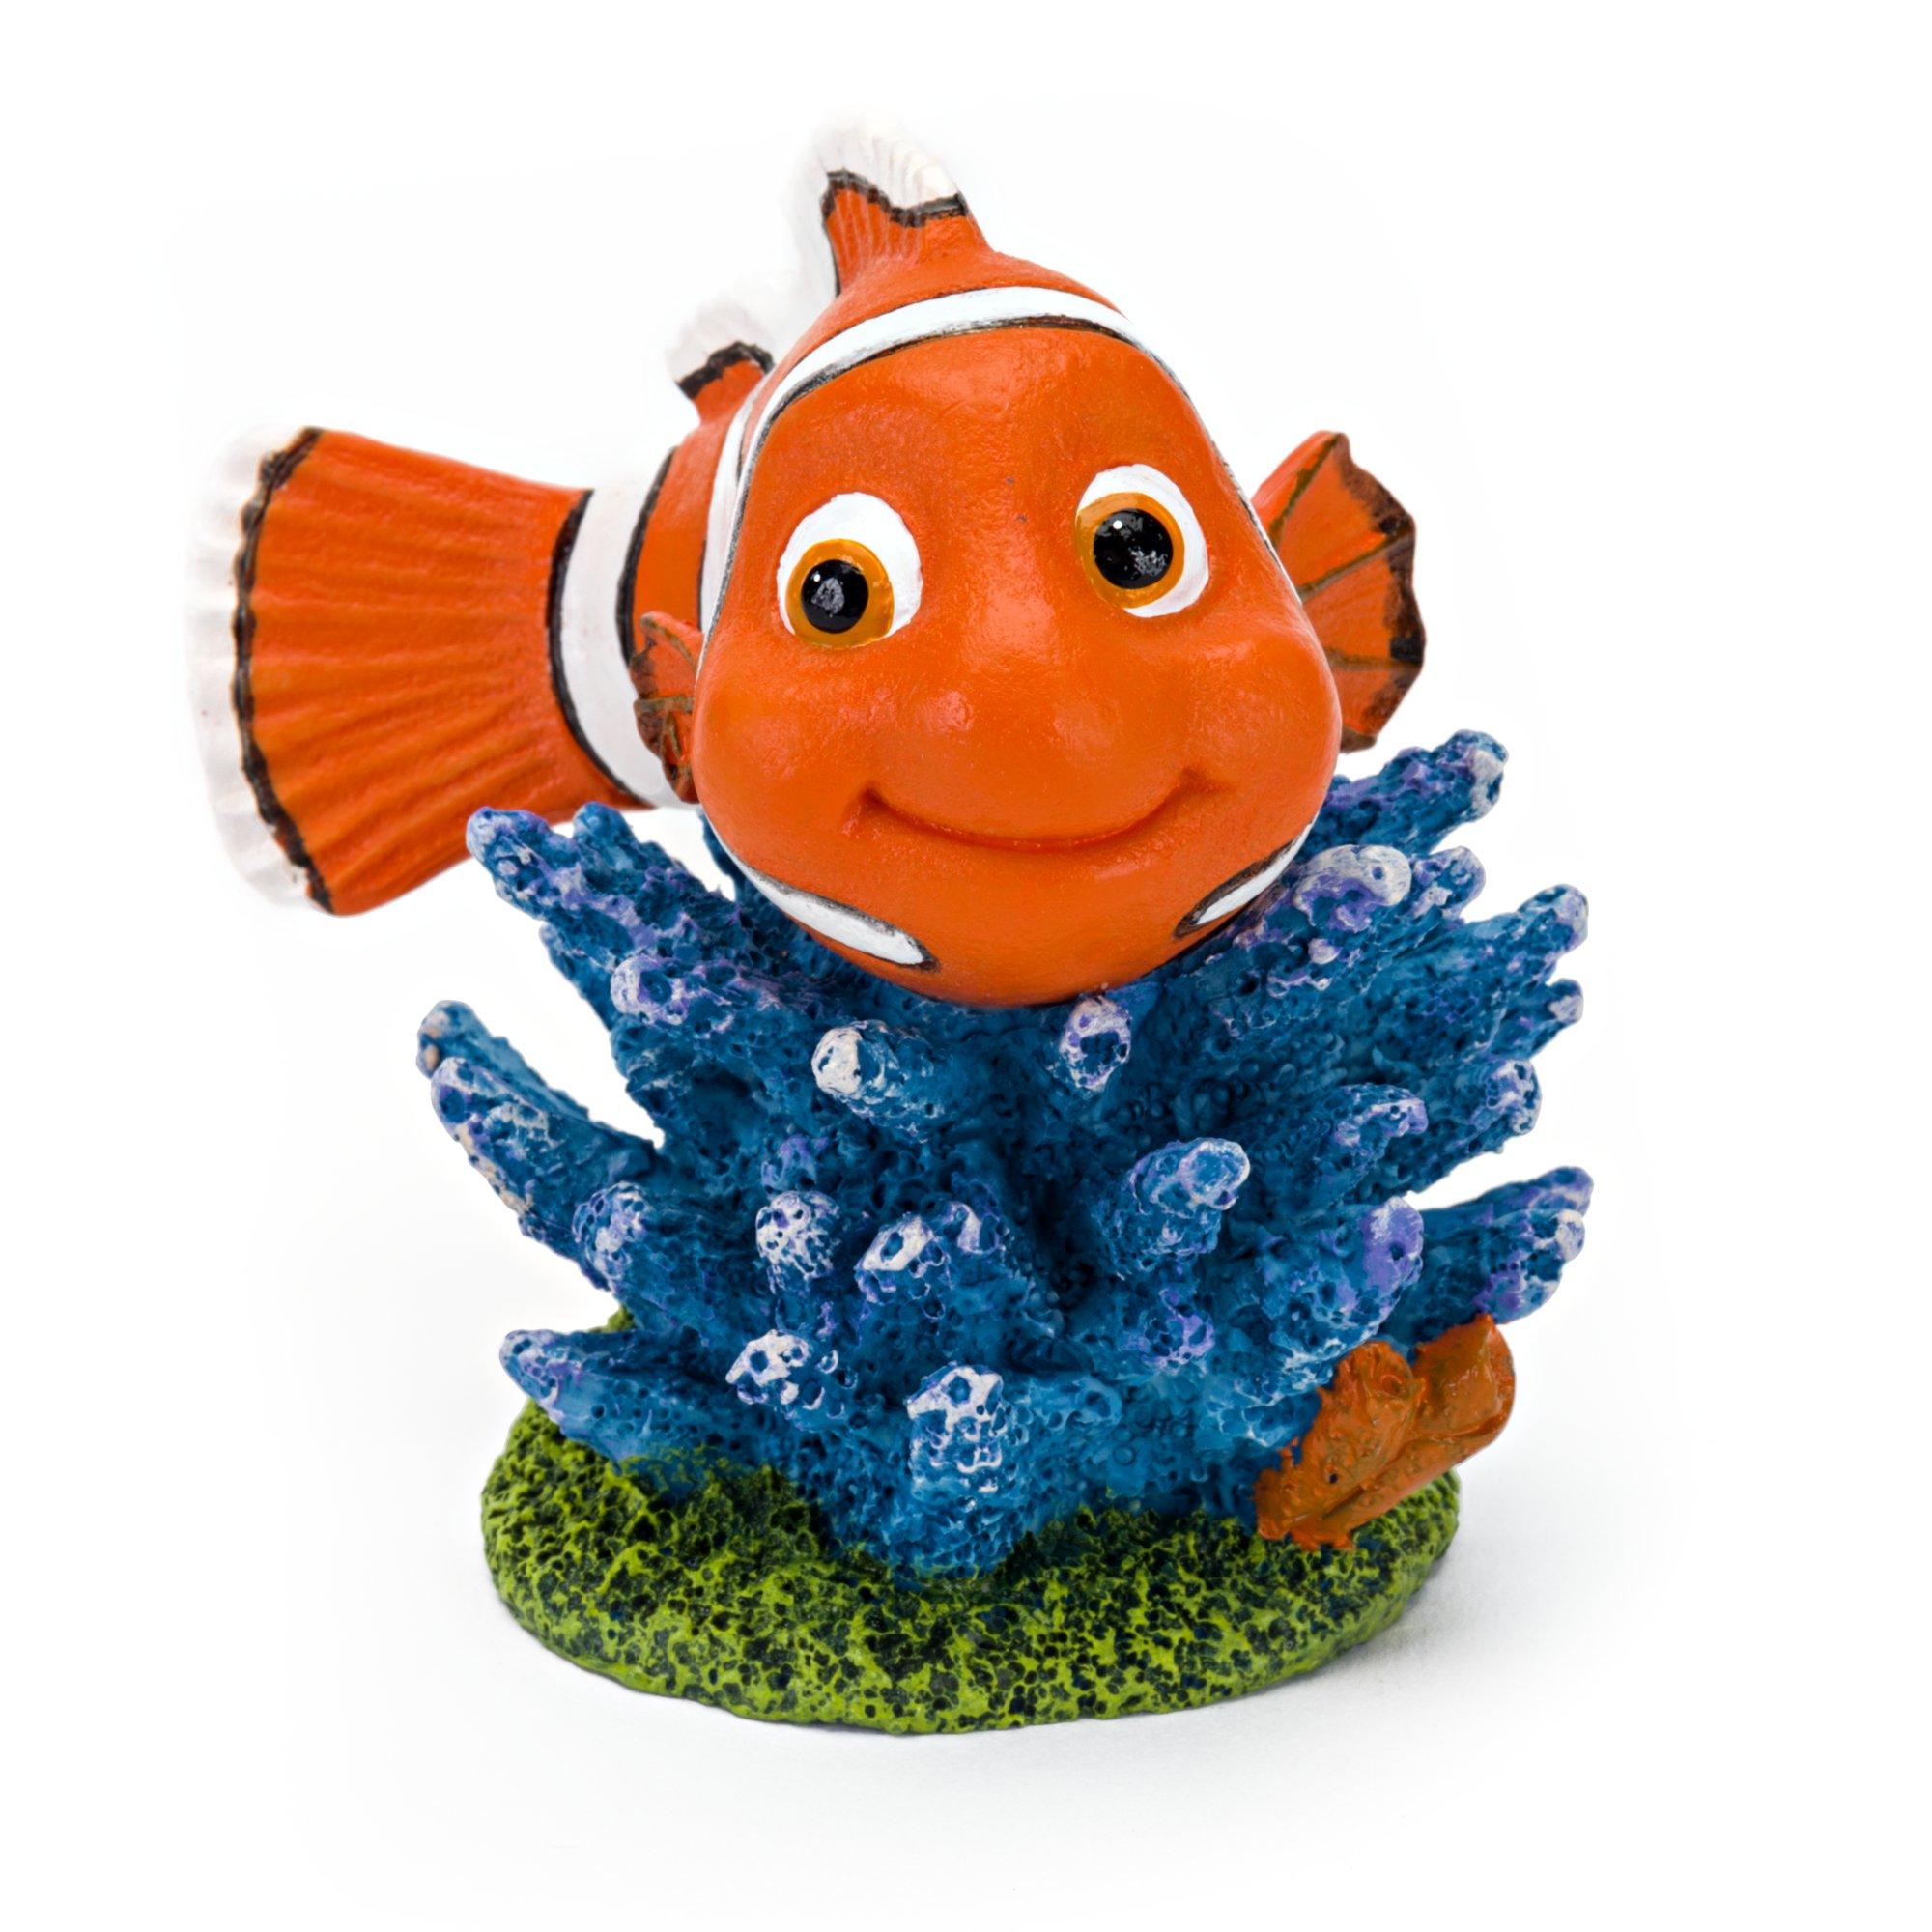 Penn Plax Disney's Finding Dory Nemo on Coral